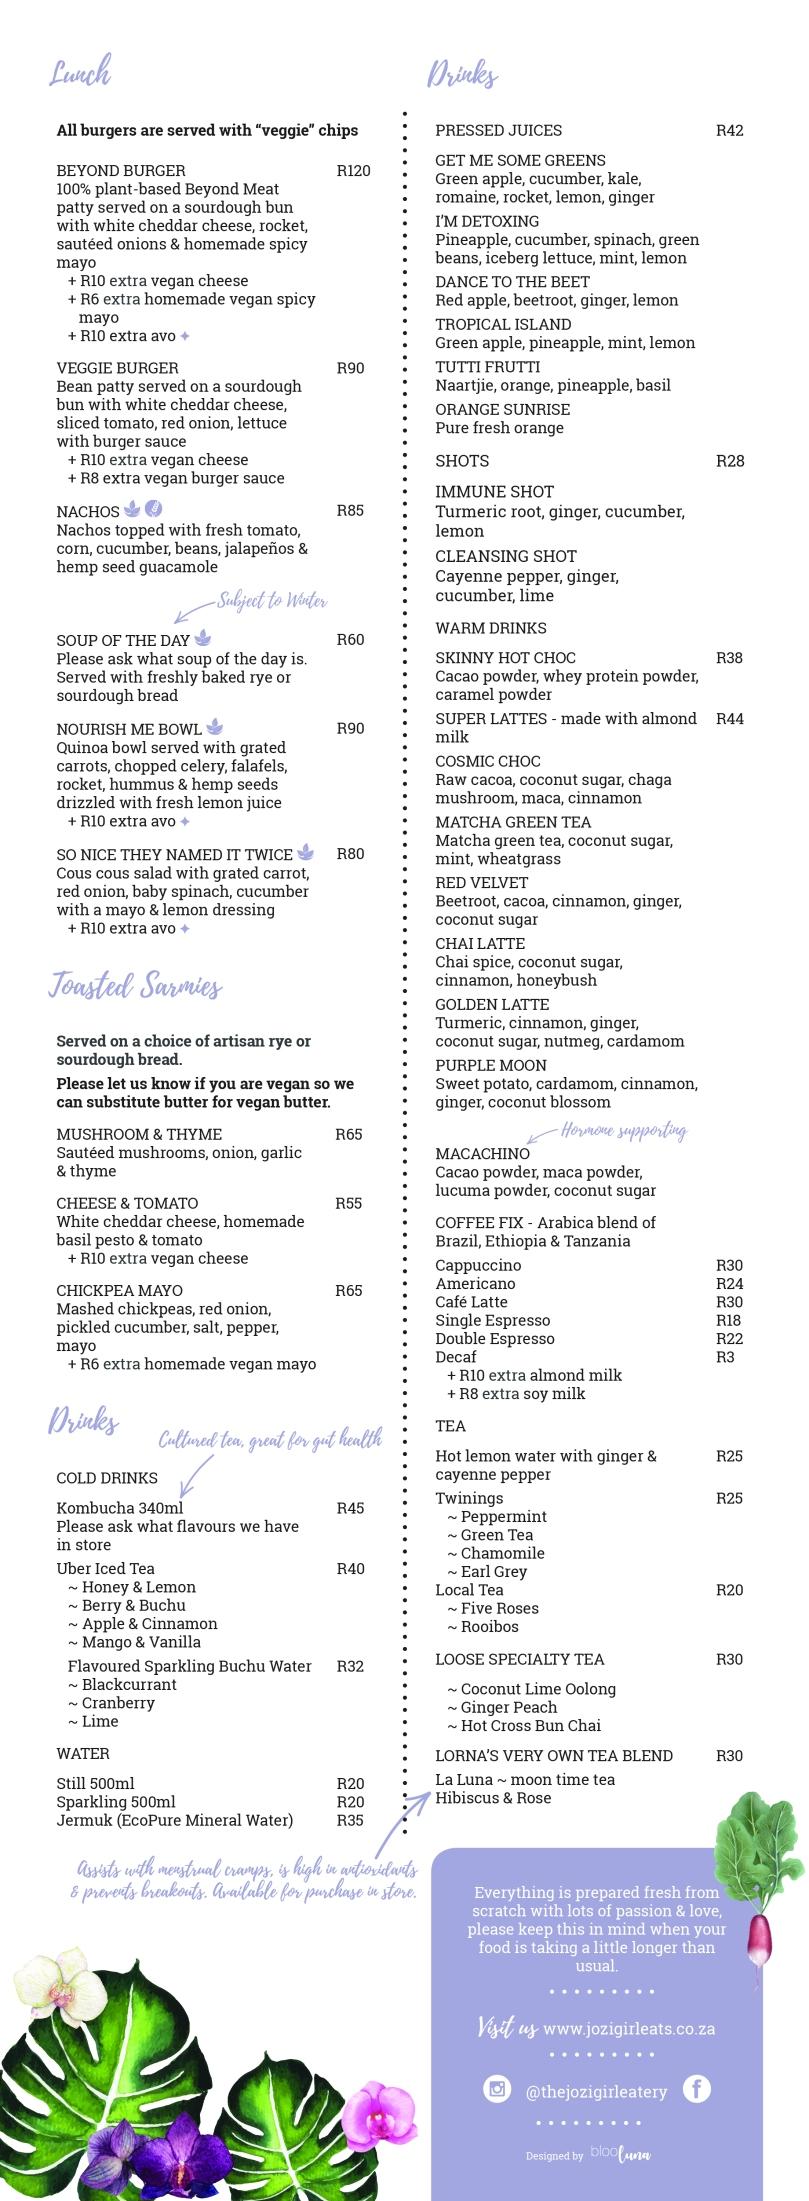 Jozi Girl Eatery menu final PRINT READY NO BLEED2